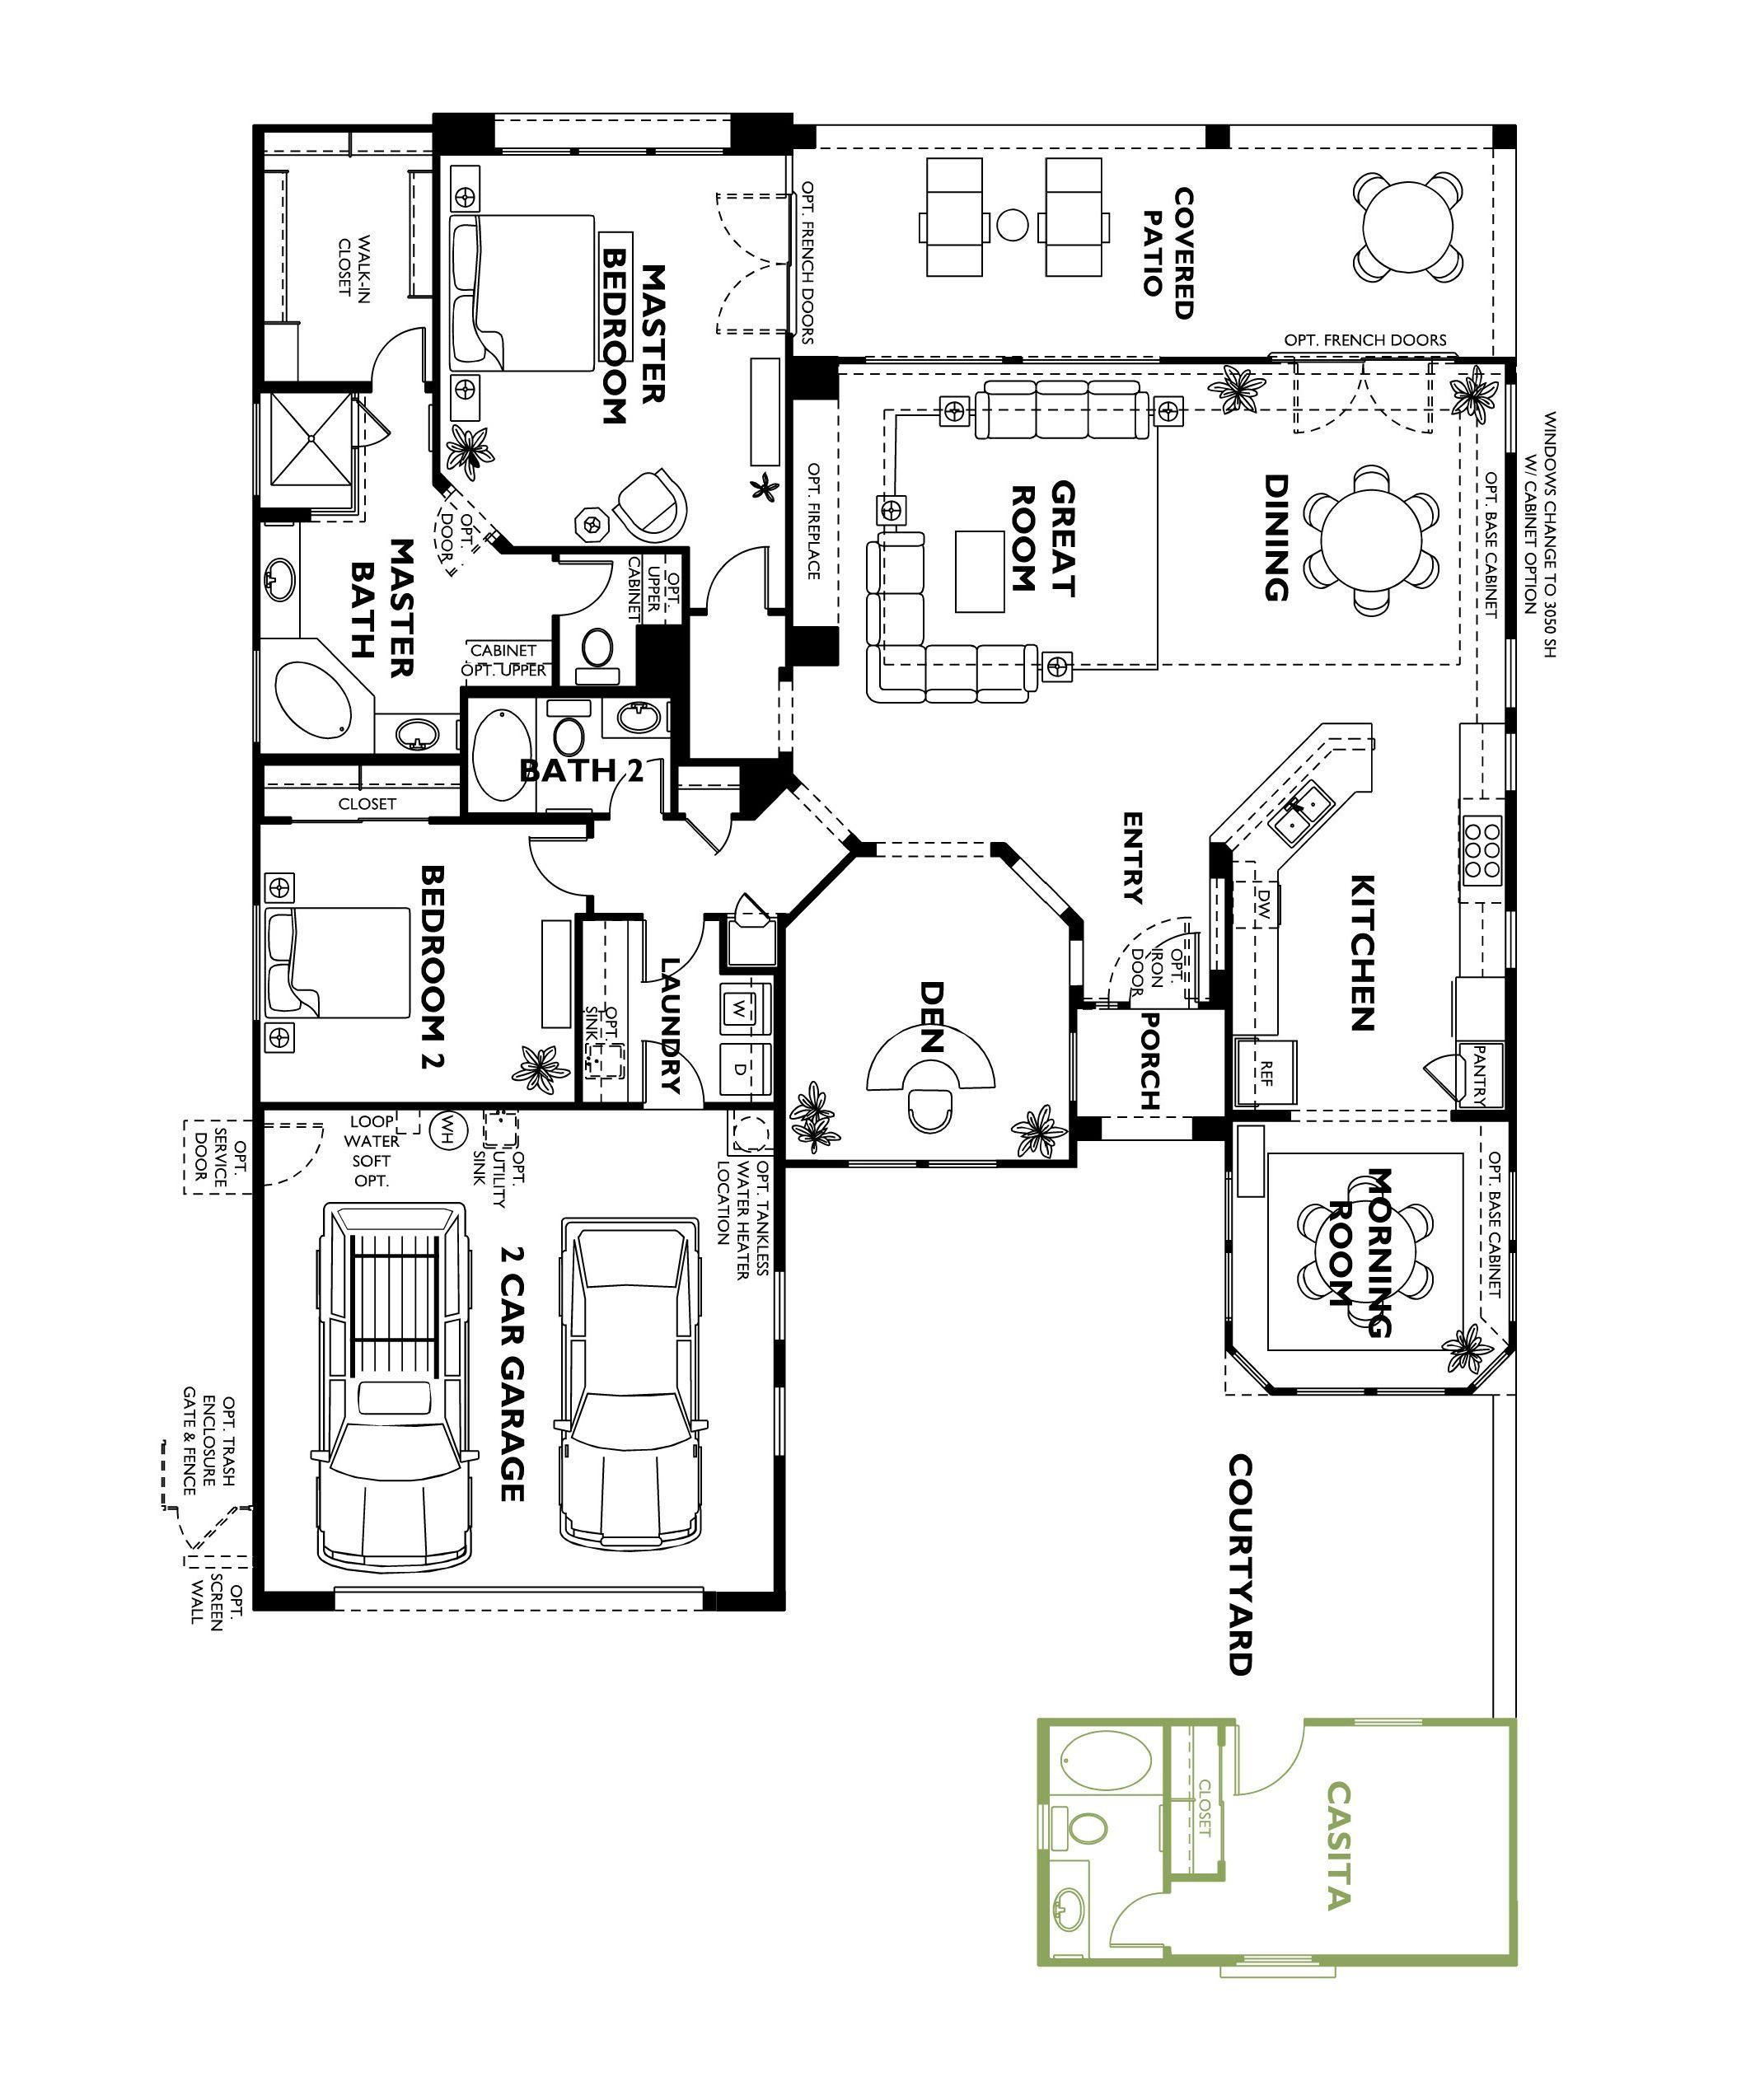 Trilogy At Vistancia Cadiz Floor Plan Model With Casita Shea Trilogy Vistancia Home House Floor Plans Model H Modern Floor Plans House Floor Plans Floor Plans